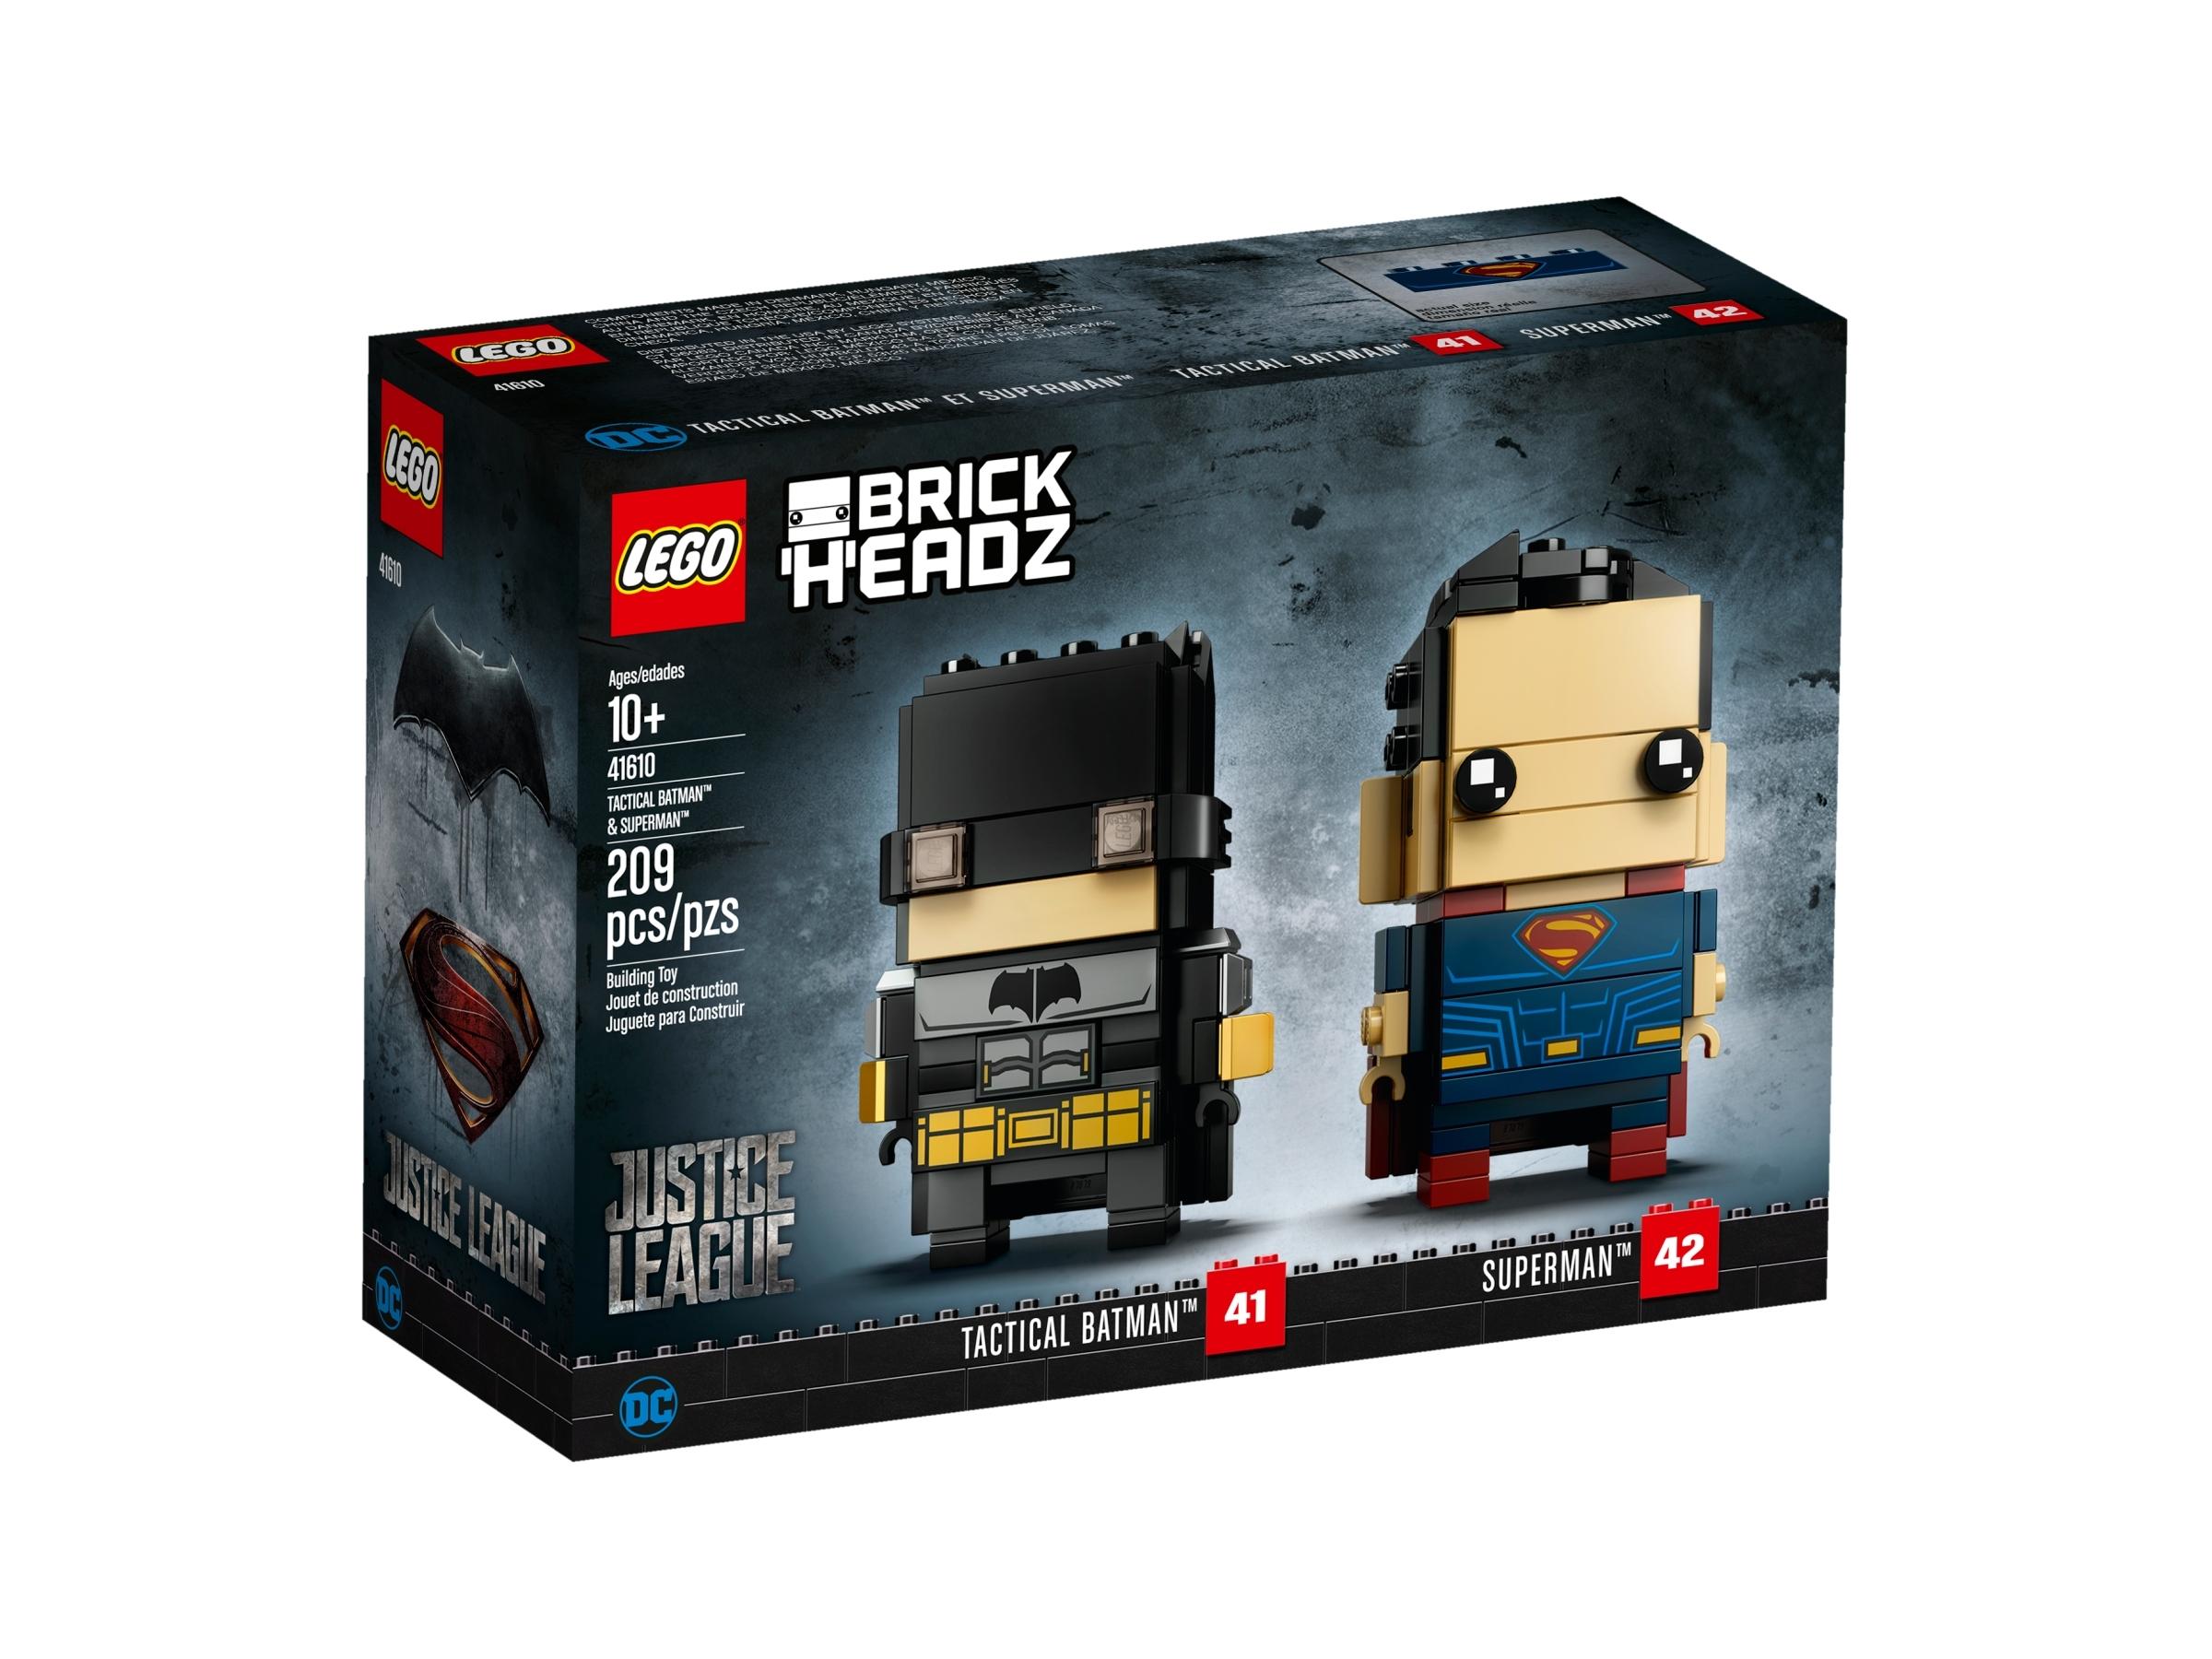 LEGO DC Justice League Brickheadz Choose a Set NEW Batman Superman